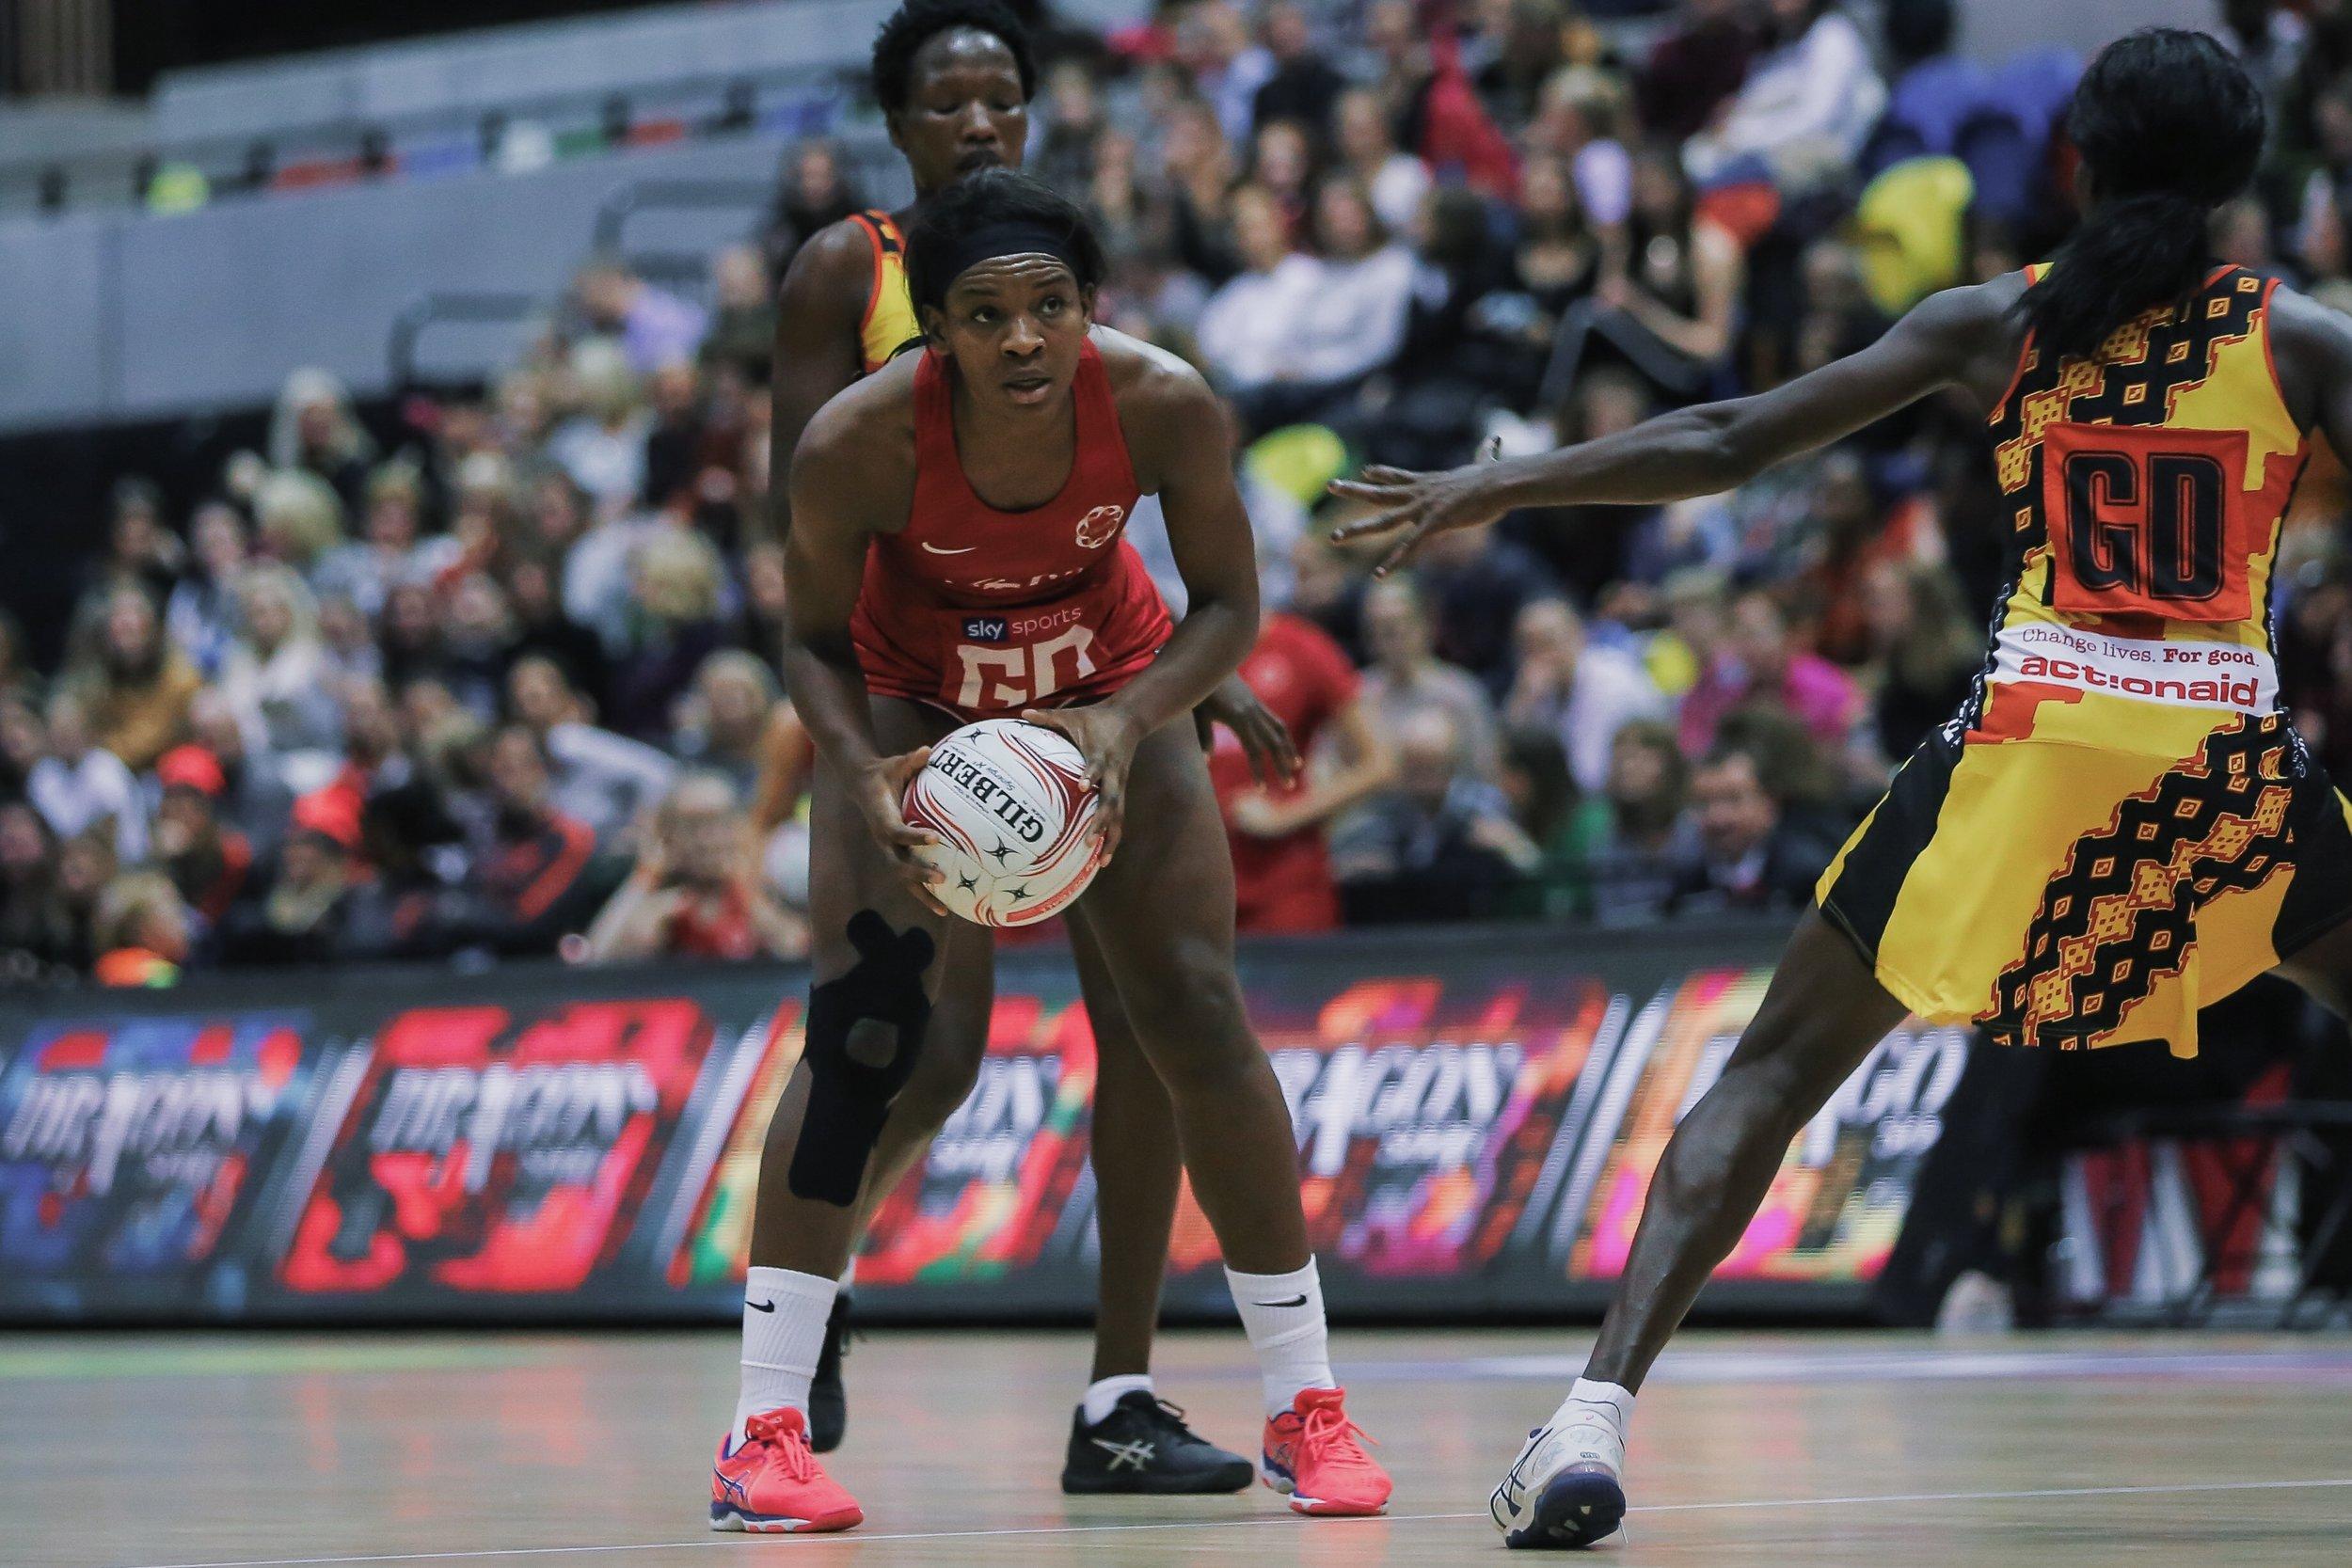 womens-netball-sport-england-uganda-international-series-24.jpg